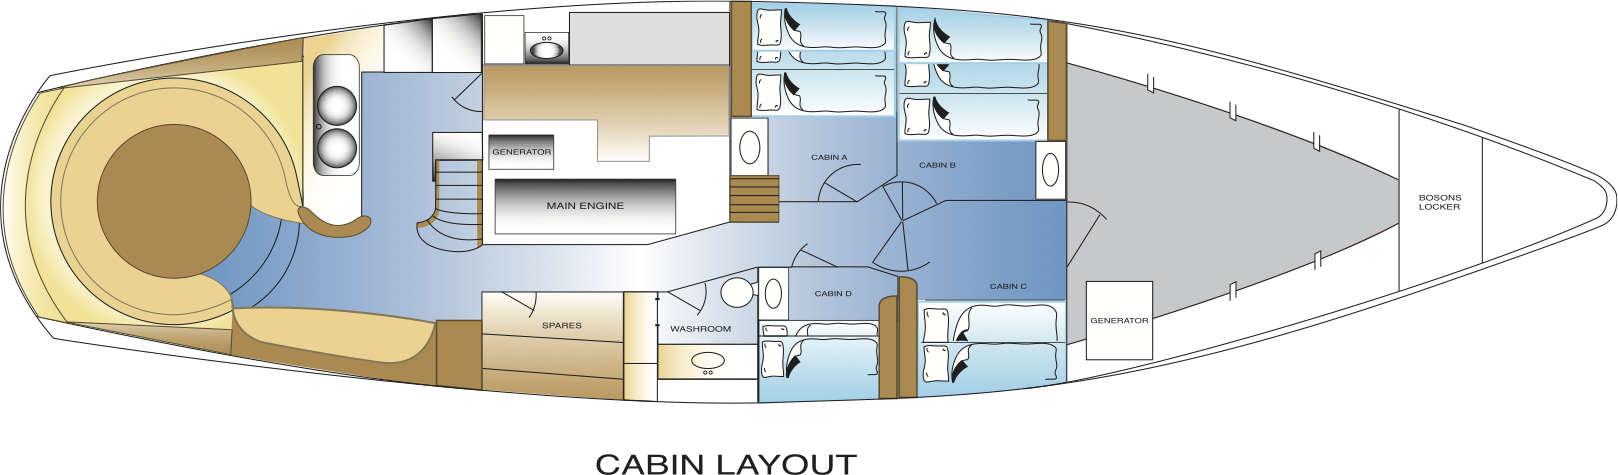 Australis cabin layout